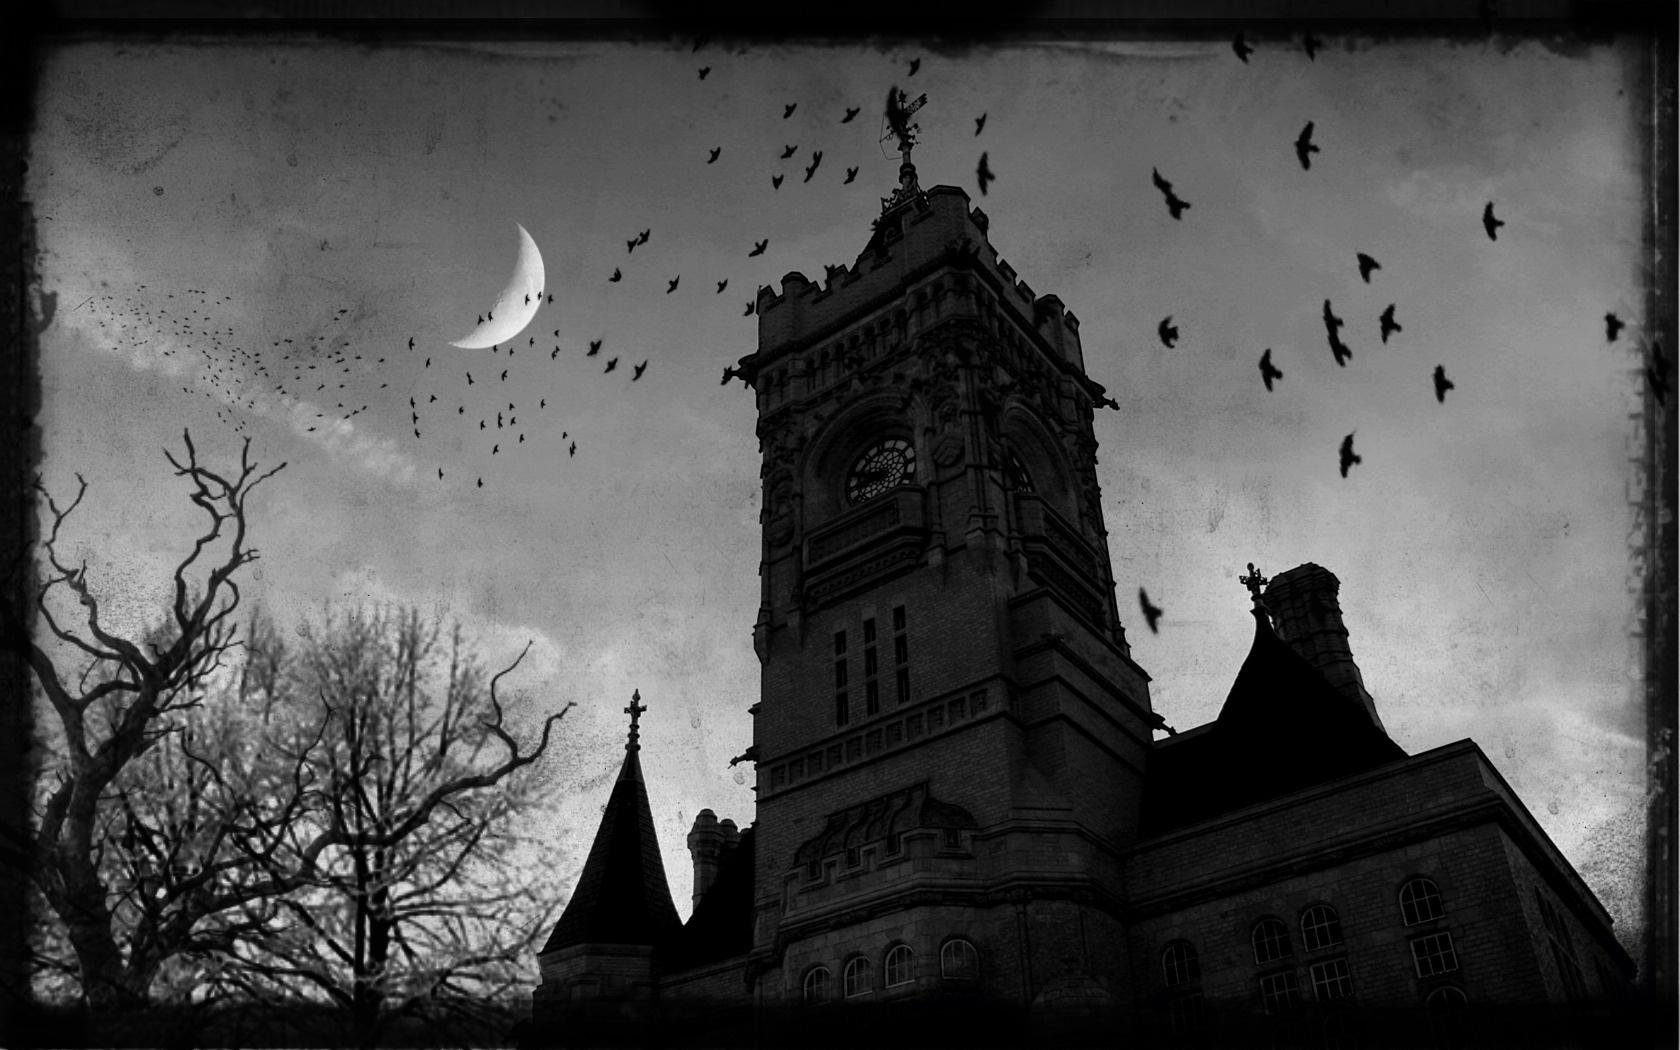 Wallpaper gothic castle dark moon raven desktop wallpaper Other 1680x1050